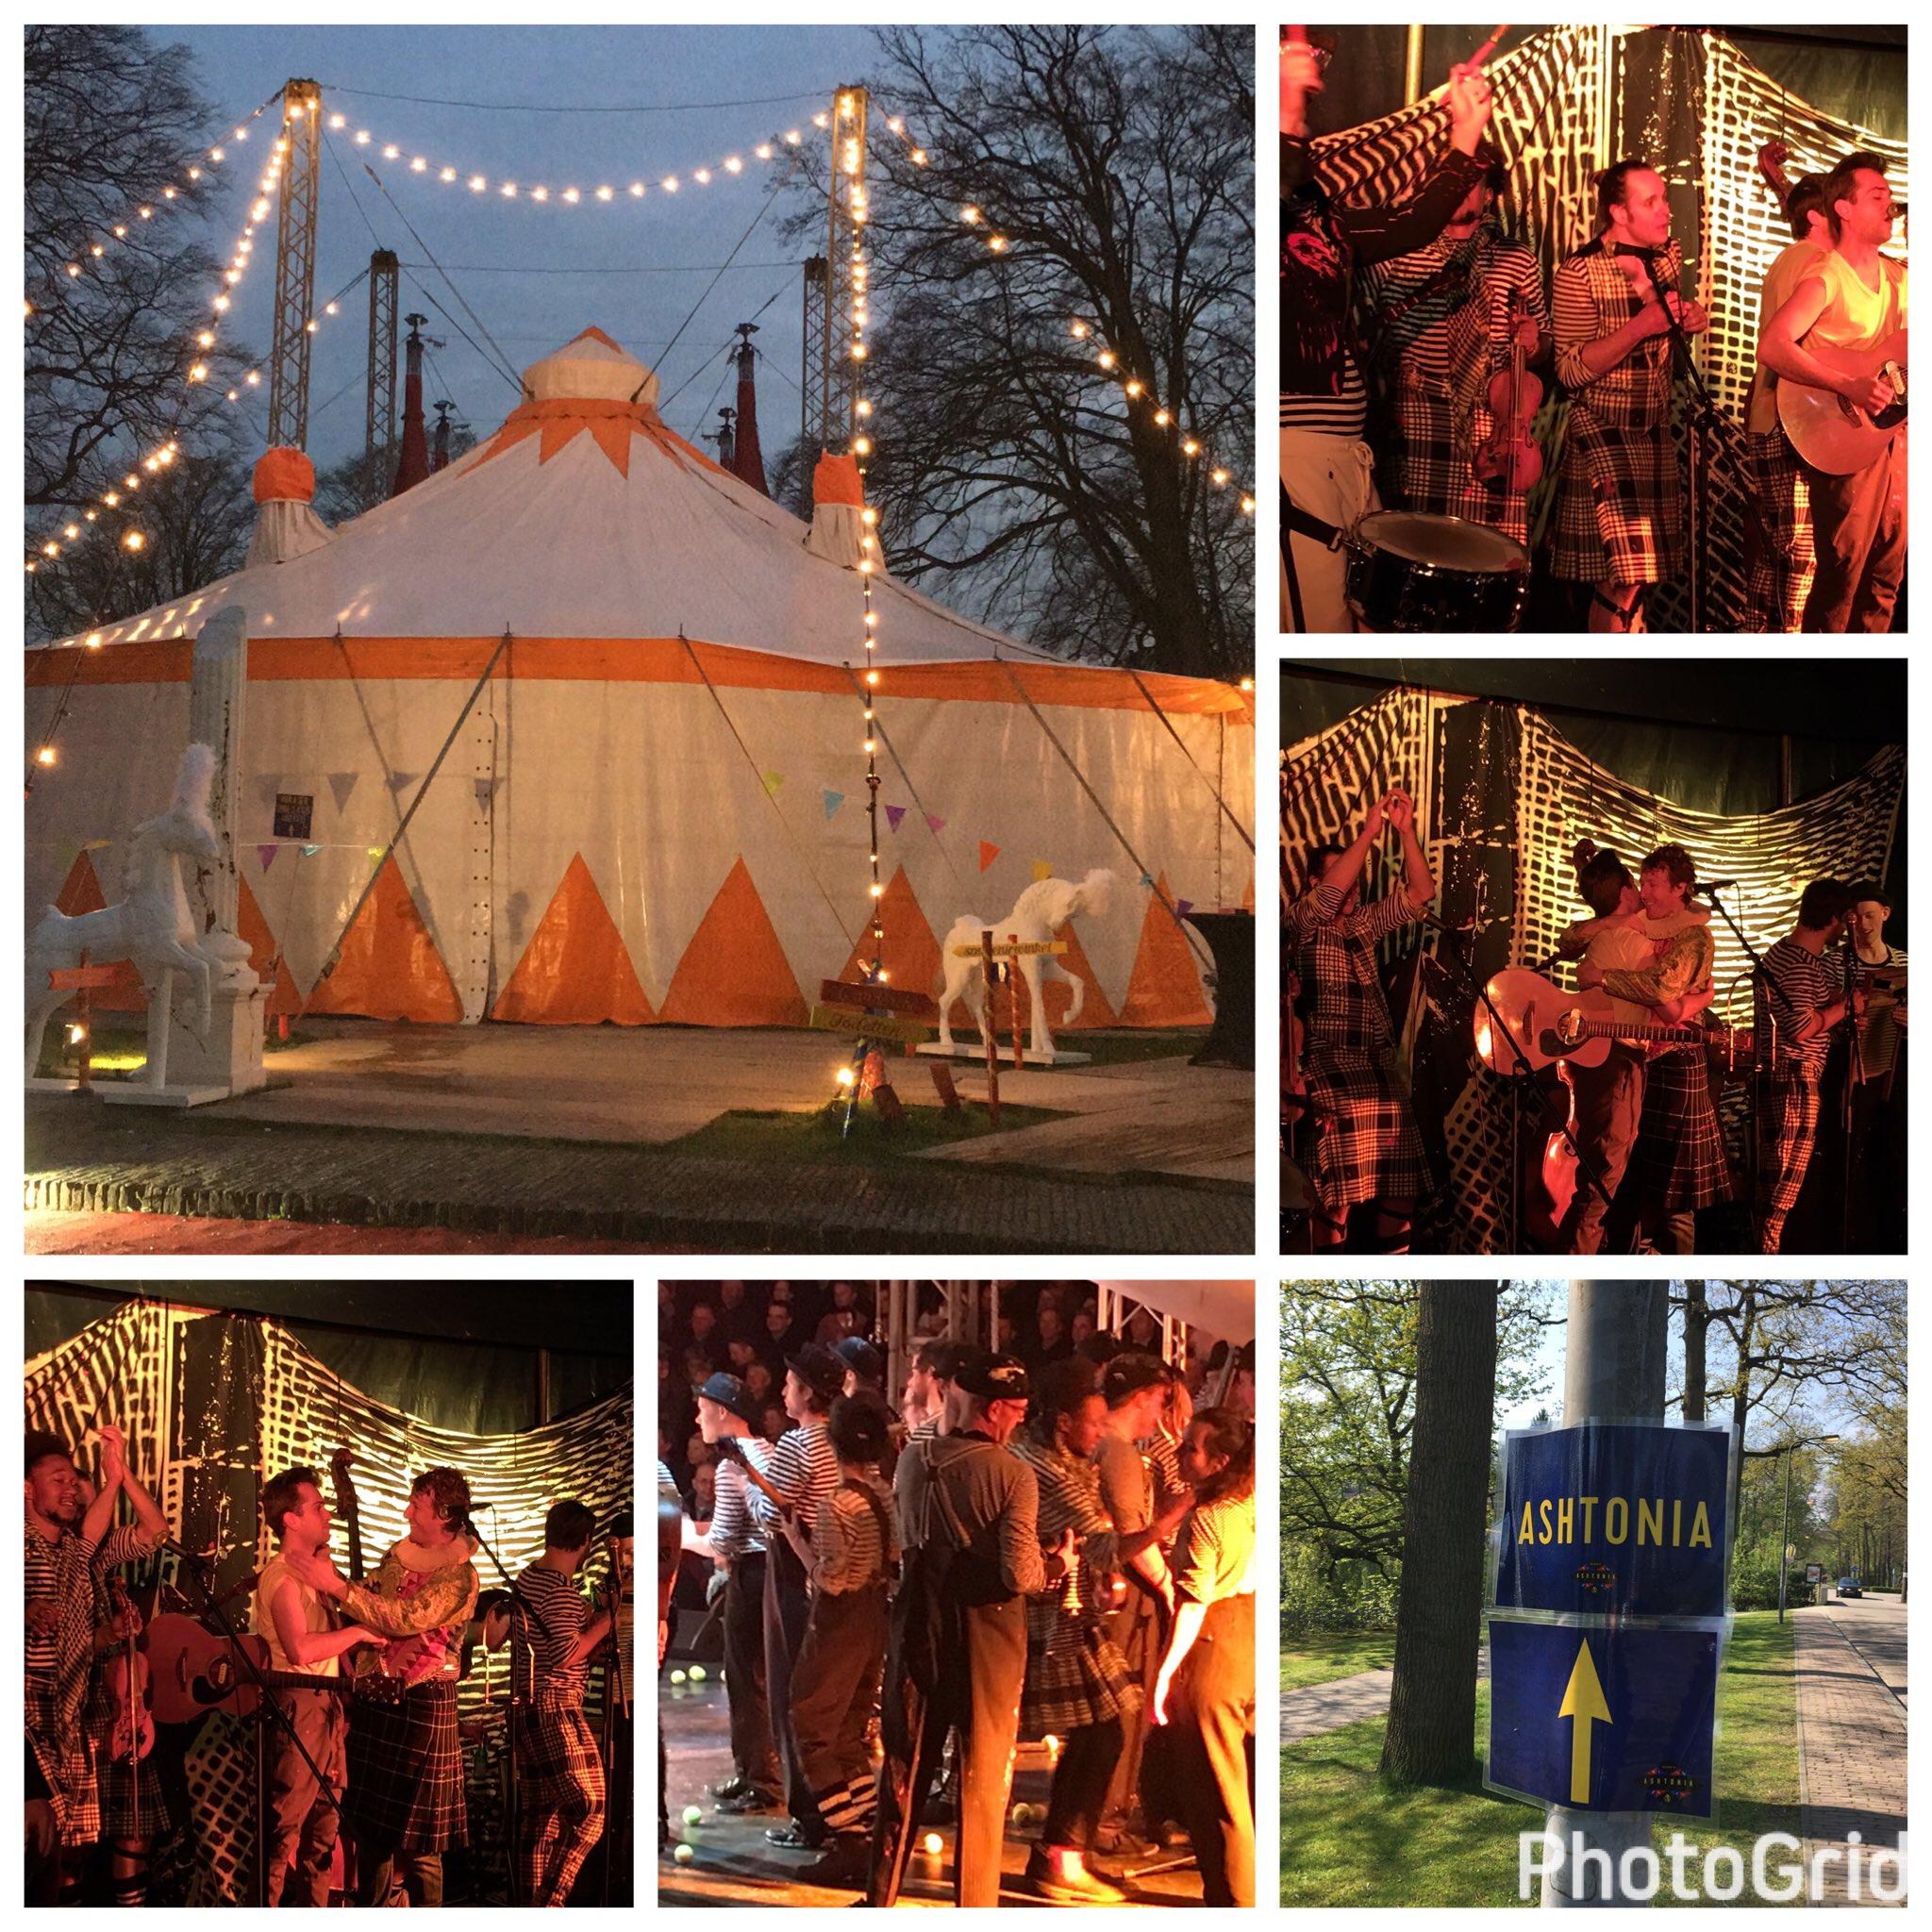 De avond viel.... de afterparty met de band : Spirit Family Réunion @spiritfam great! #dansen #swingen #zingen #goinghome ❤@AshtonBrothers https://t.co/PvYCDHPYBG